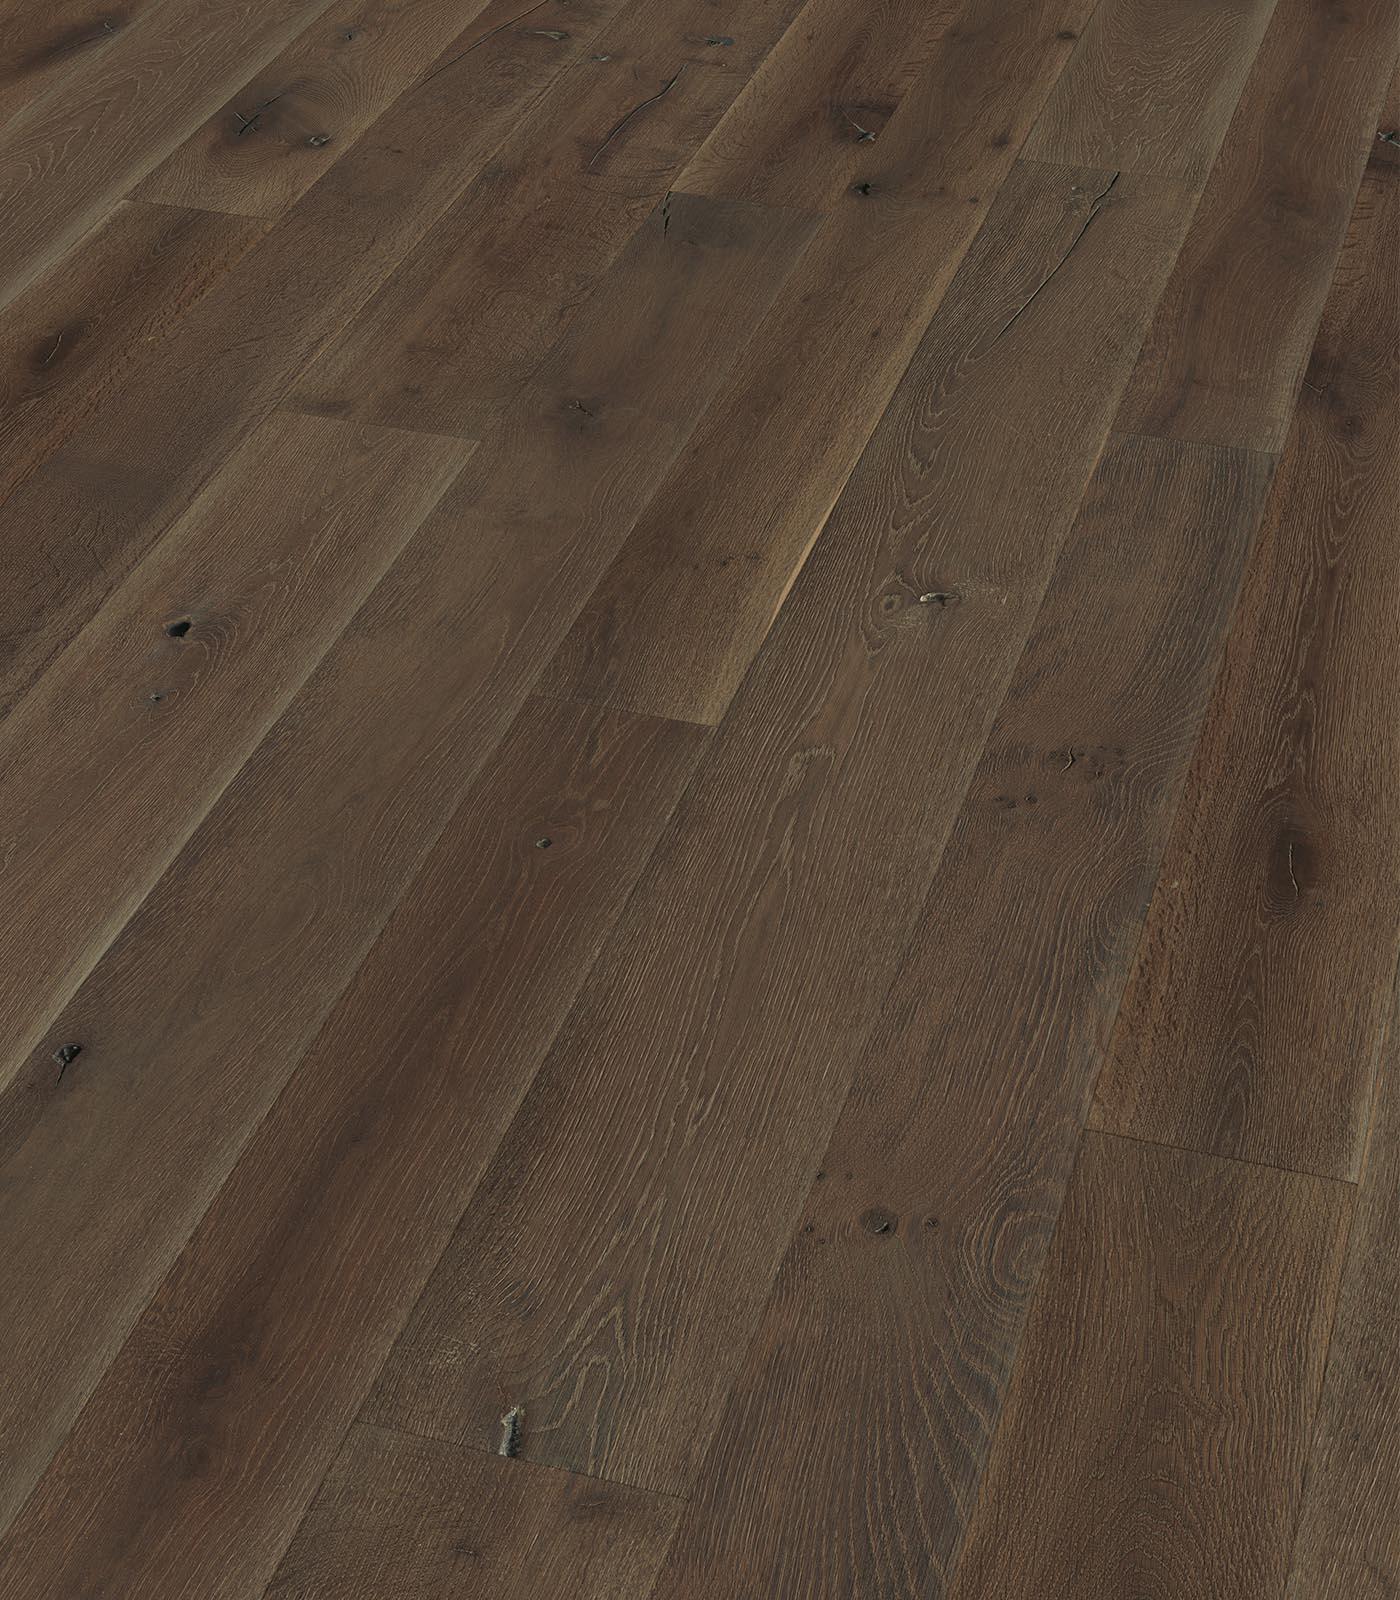 Segovia-Heritage Collection-European Oak Floors-angle